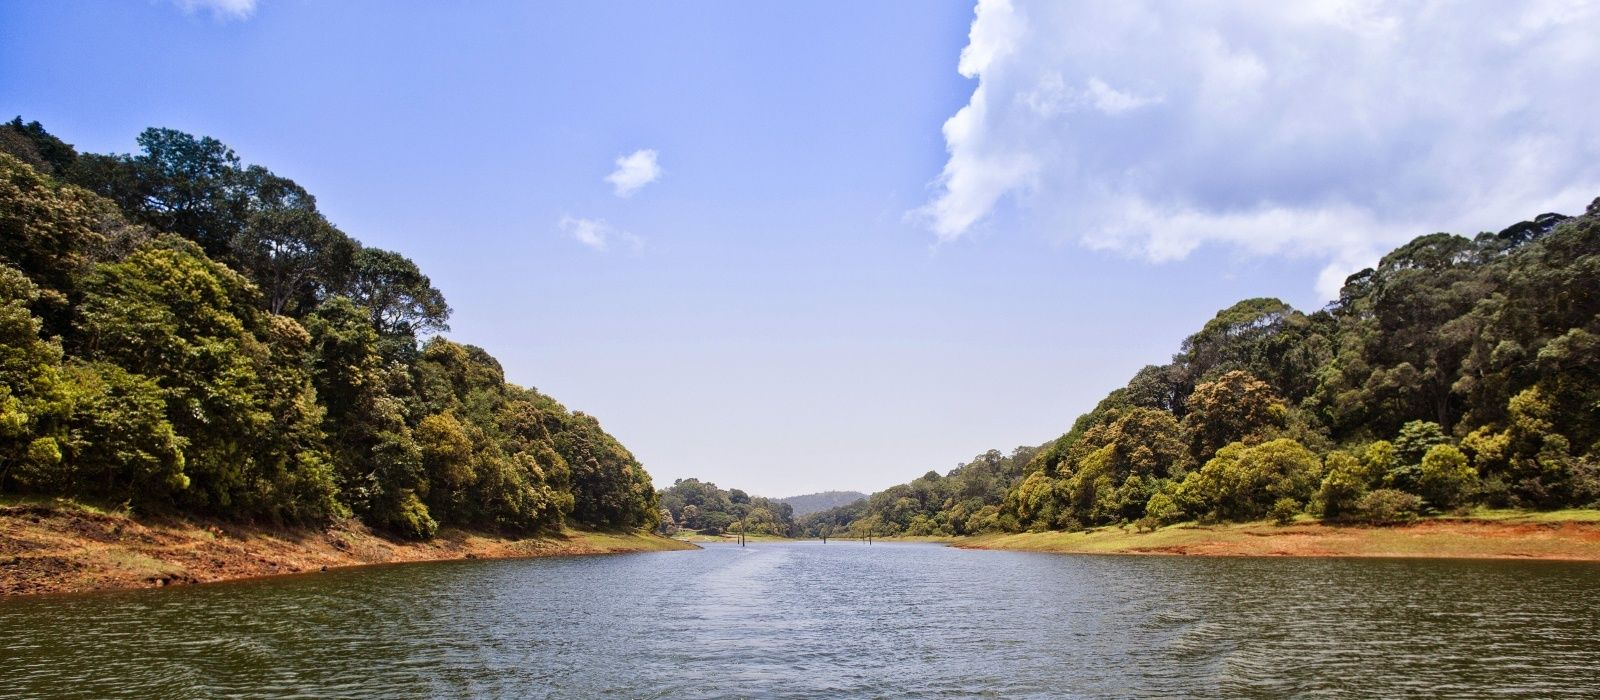 Kerala: Backwater & Plantagen Urlaub 3